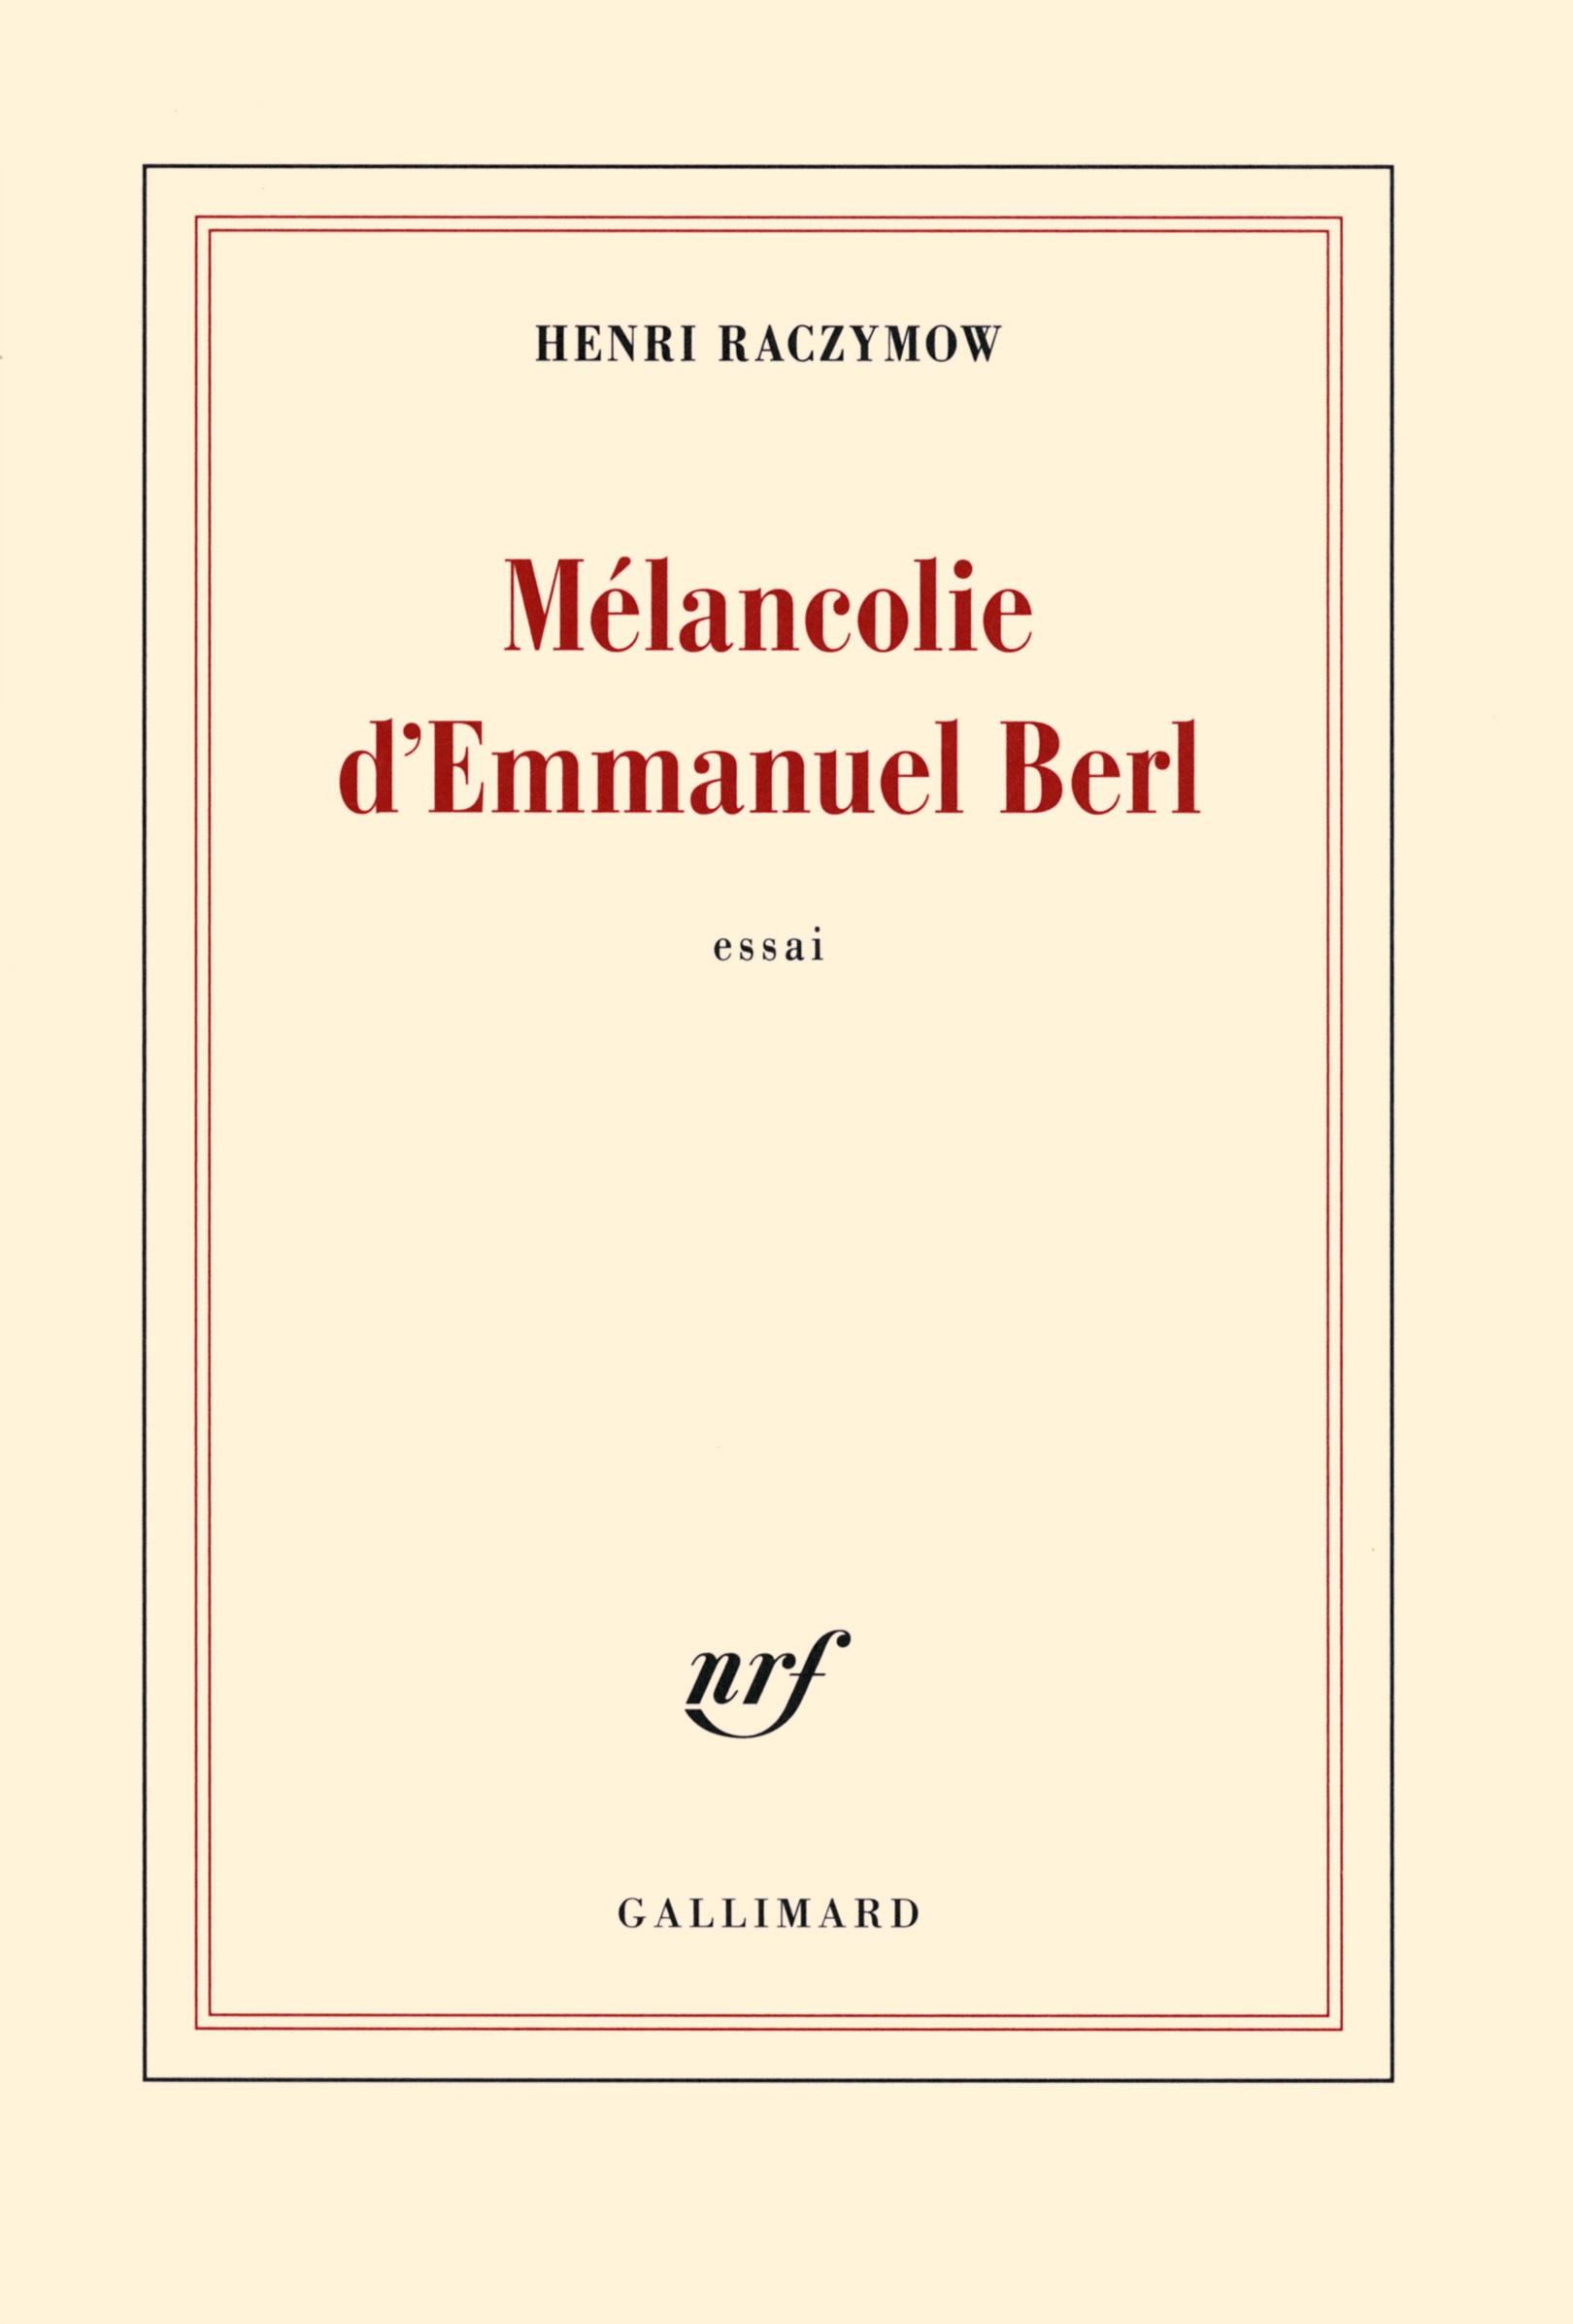 Mélancolie d'Emmanuel Berl